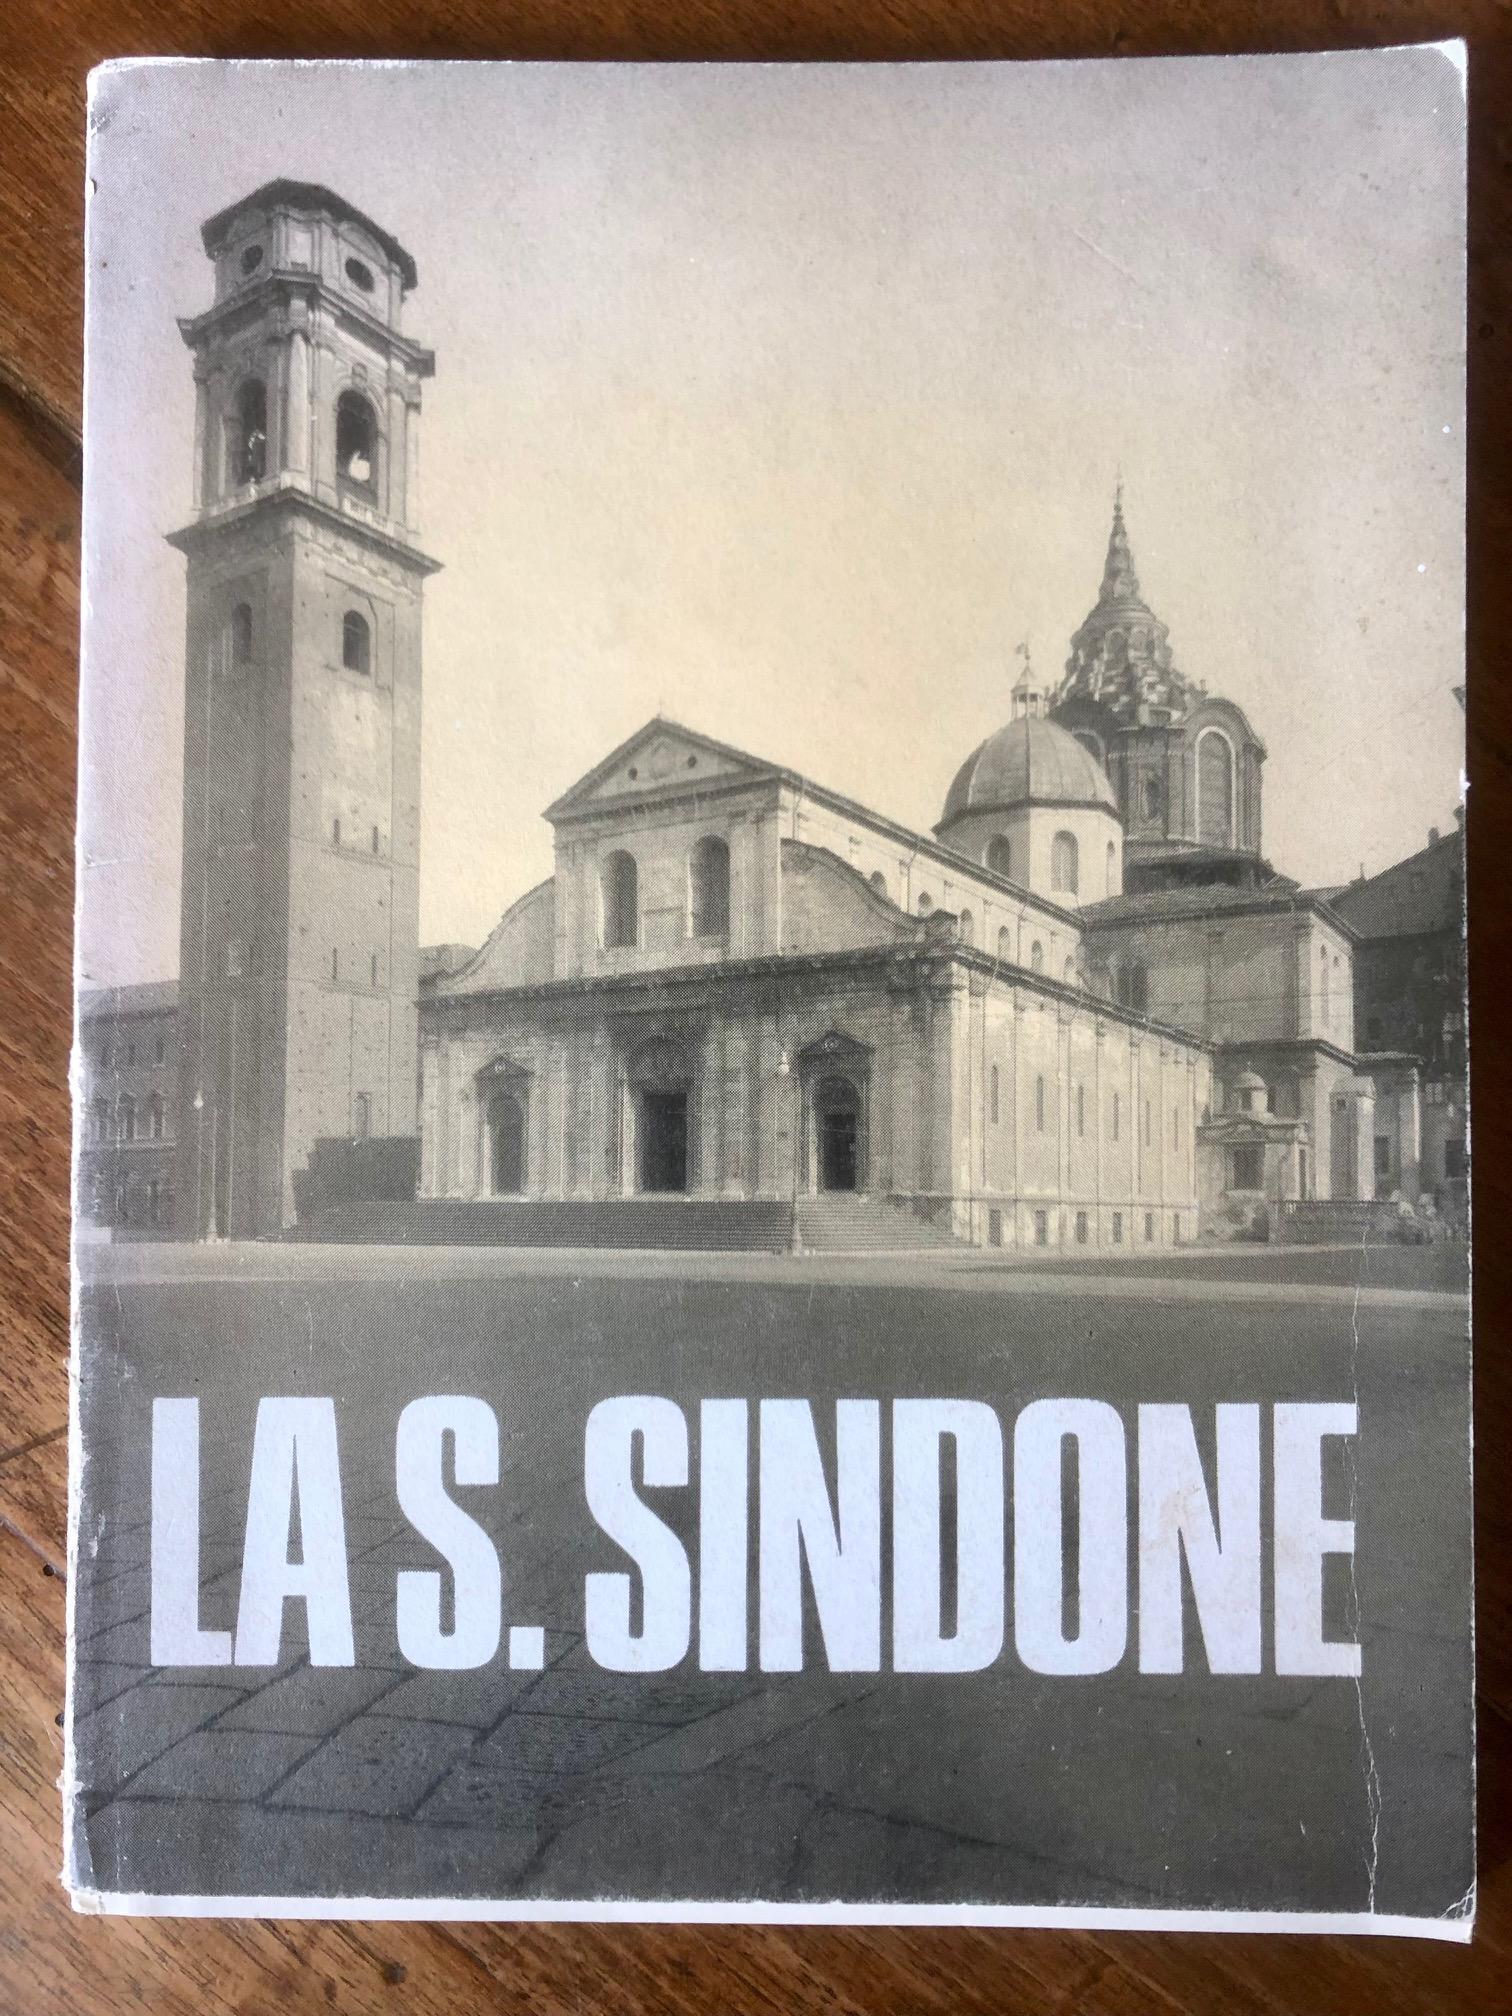 La S. Sindone